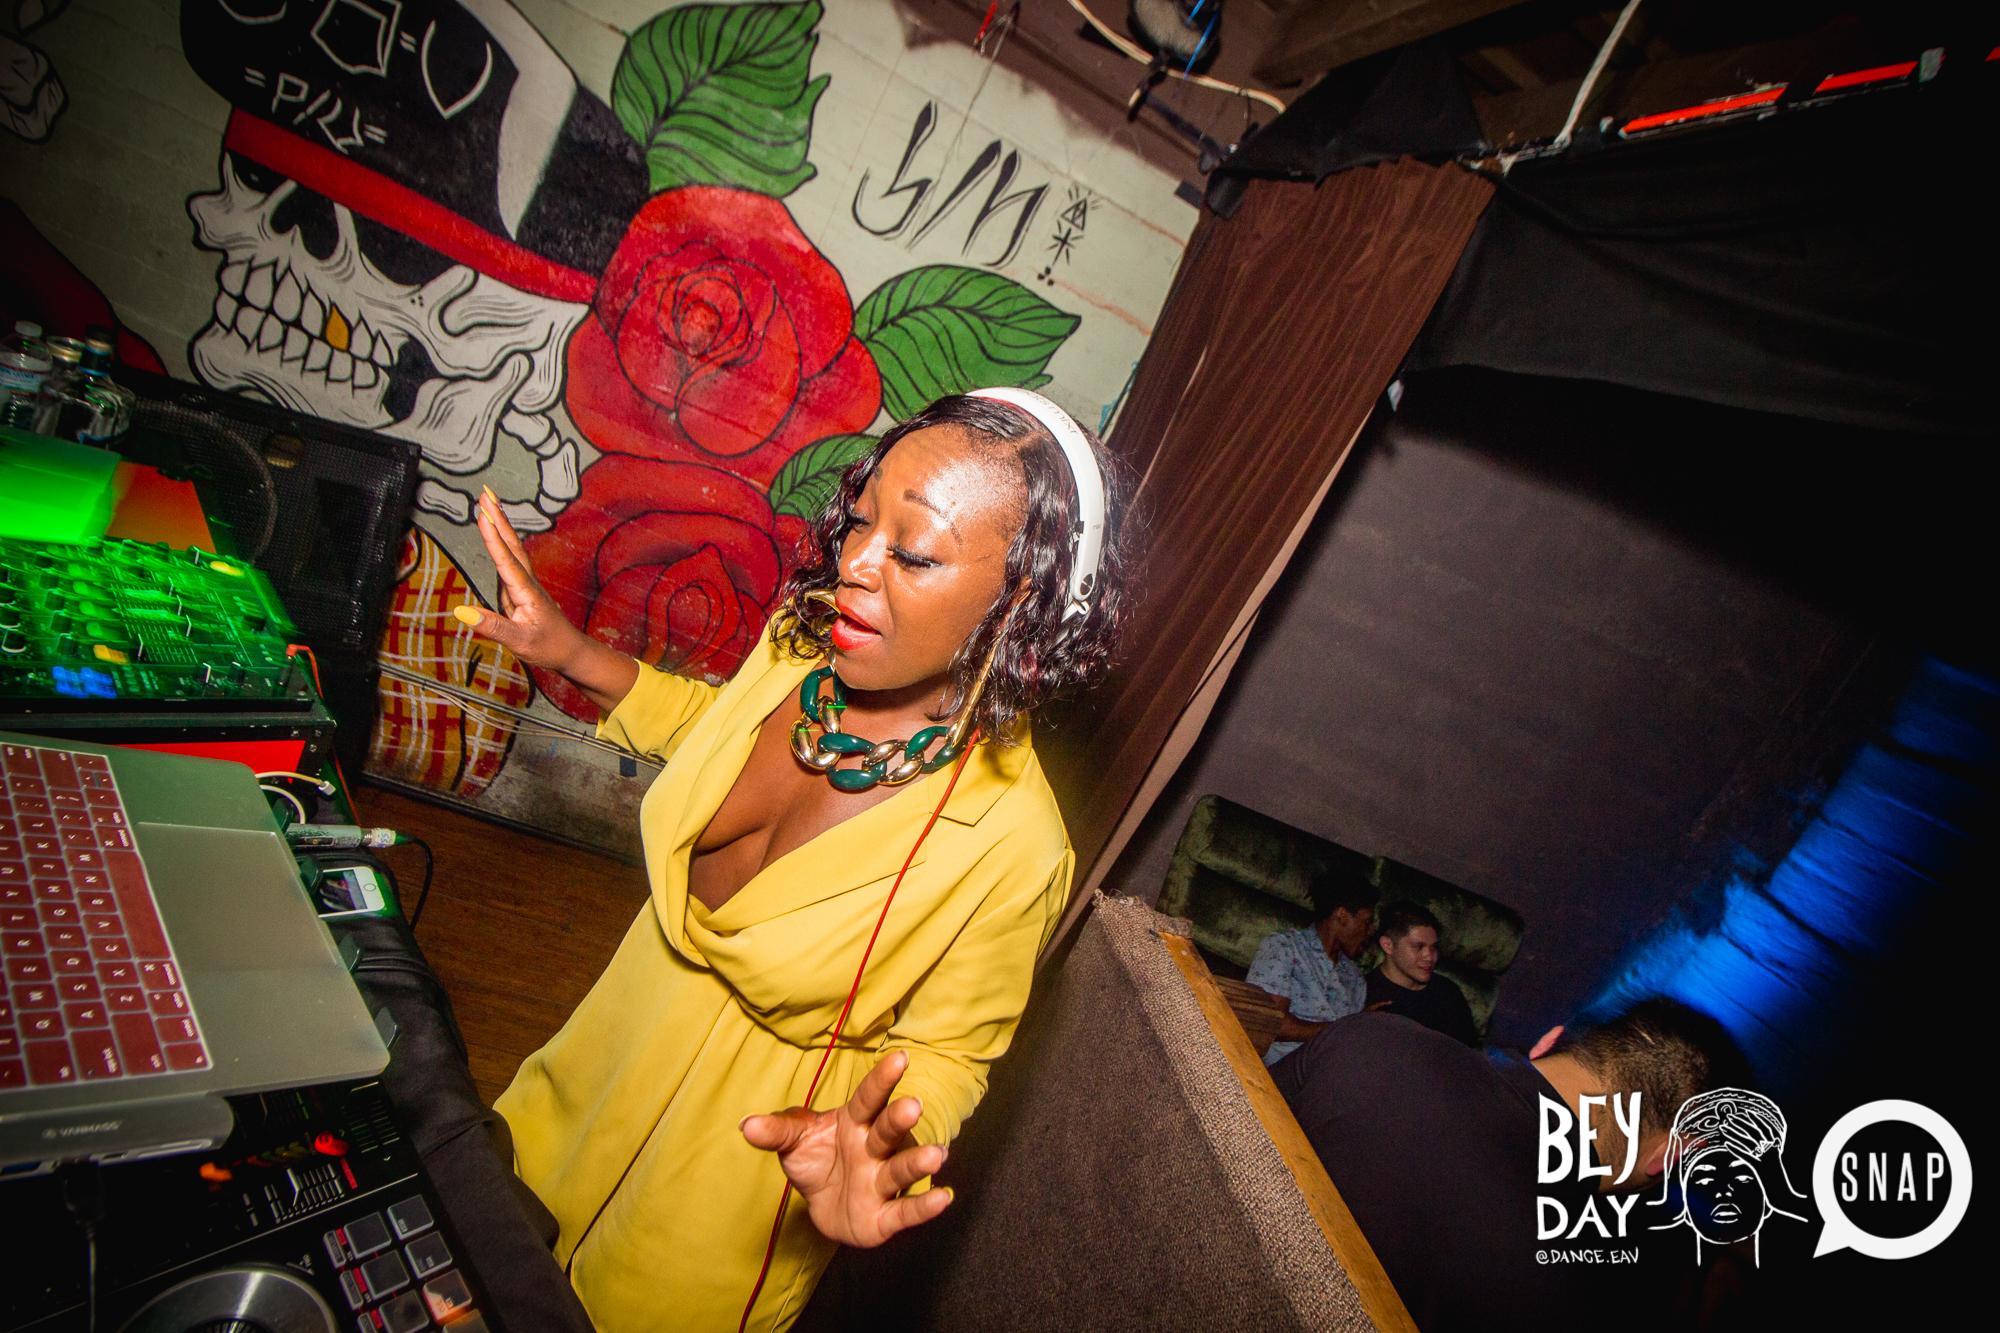 185Bey Day Grace Kelly The Basement Atlanta Oh Snap Kid.jpg